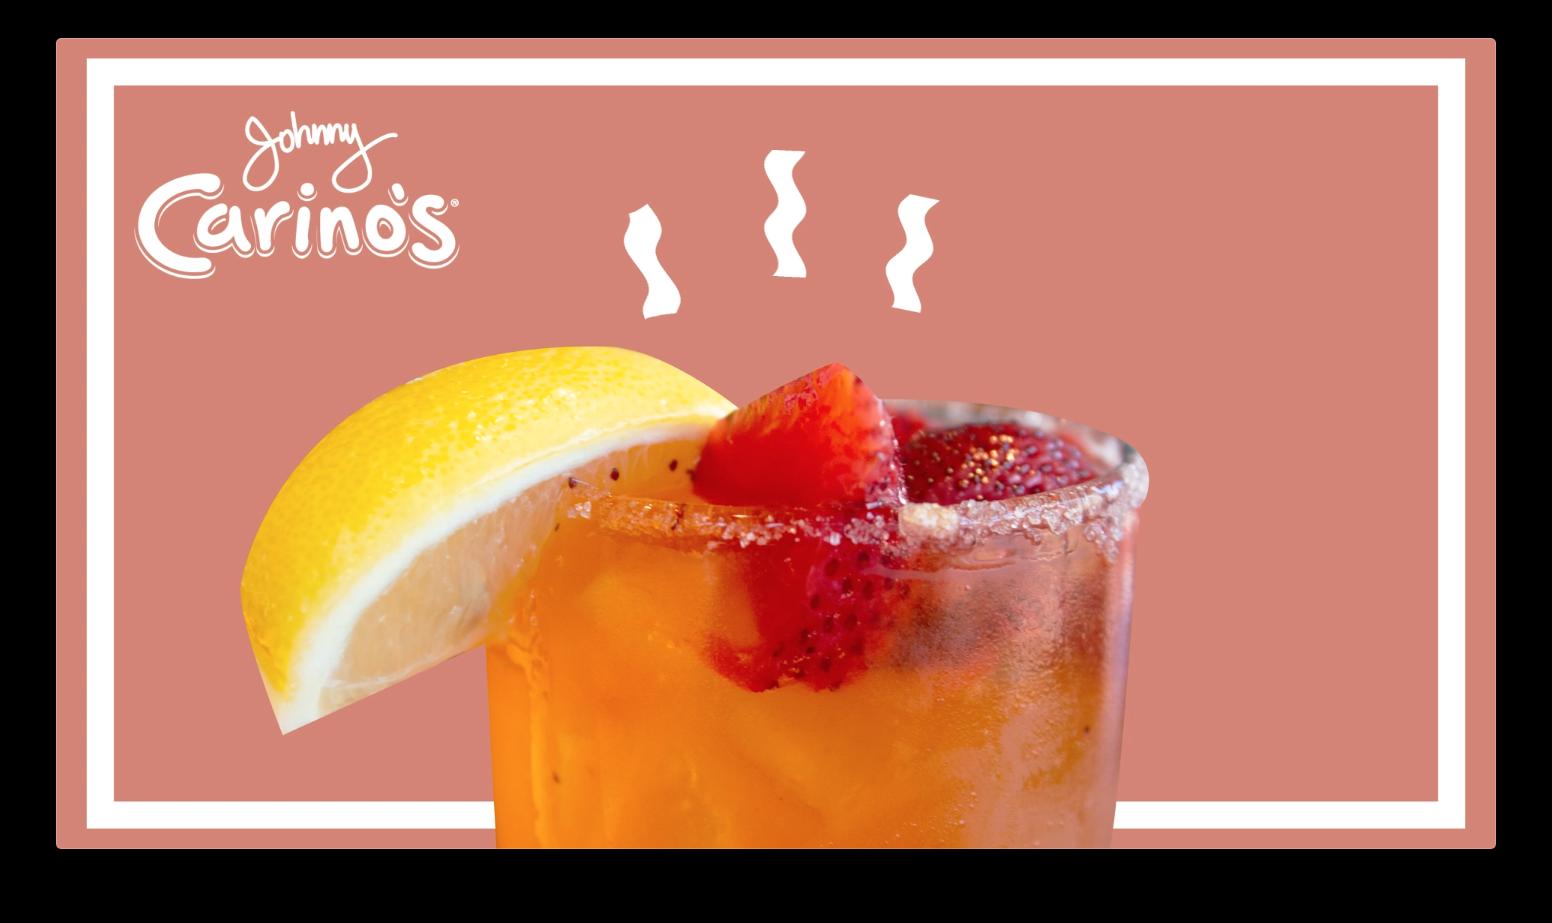 johnny carino's drink motion graphic screenshot